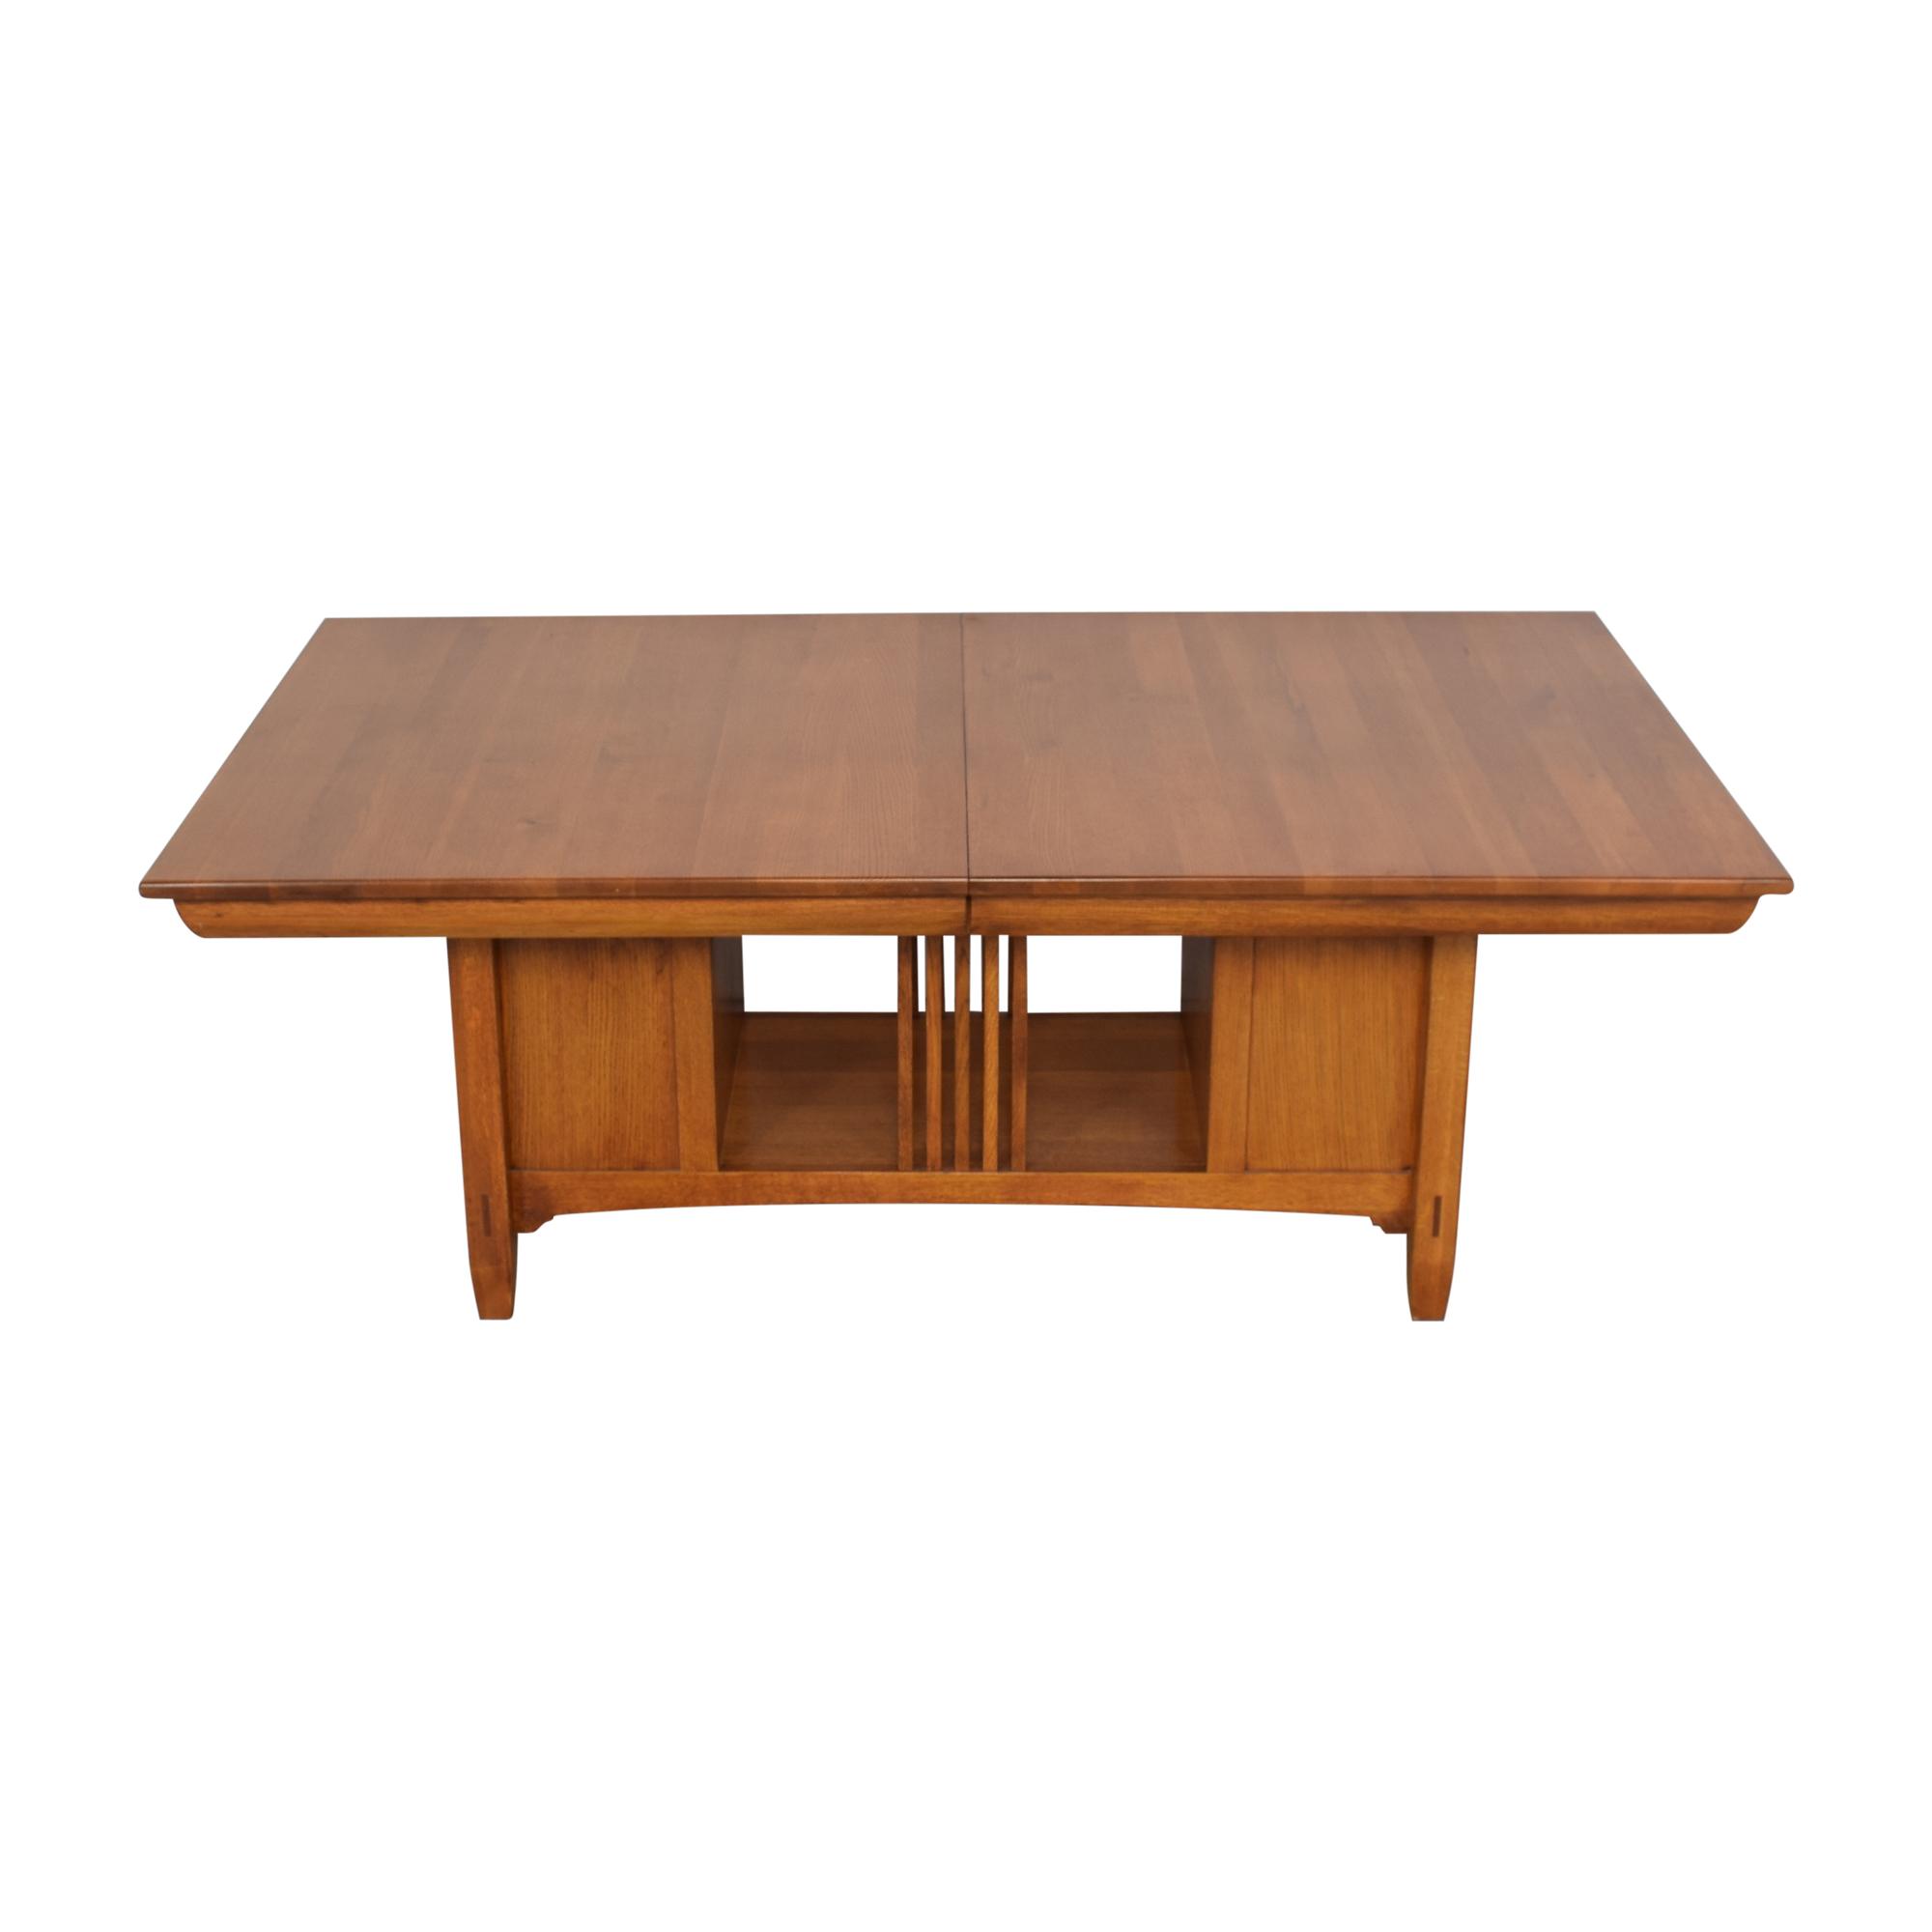 shop Lexington Bob Timberlake Arts & Crafts Collection Storage Dining Table Lexington Furniture